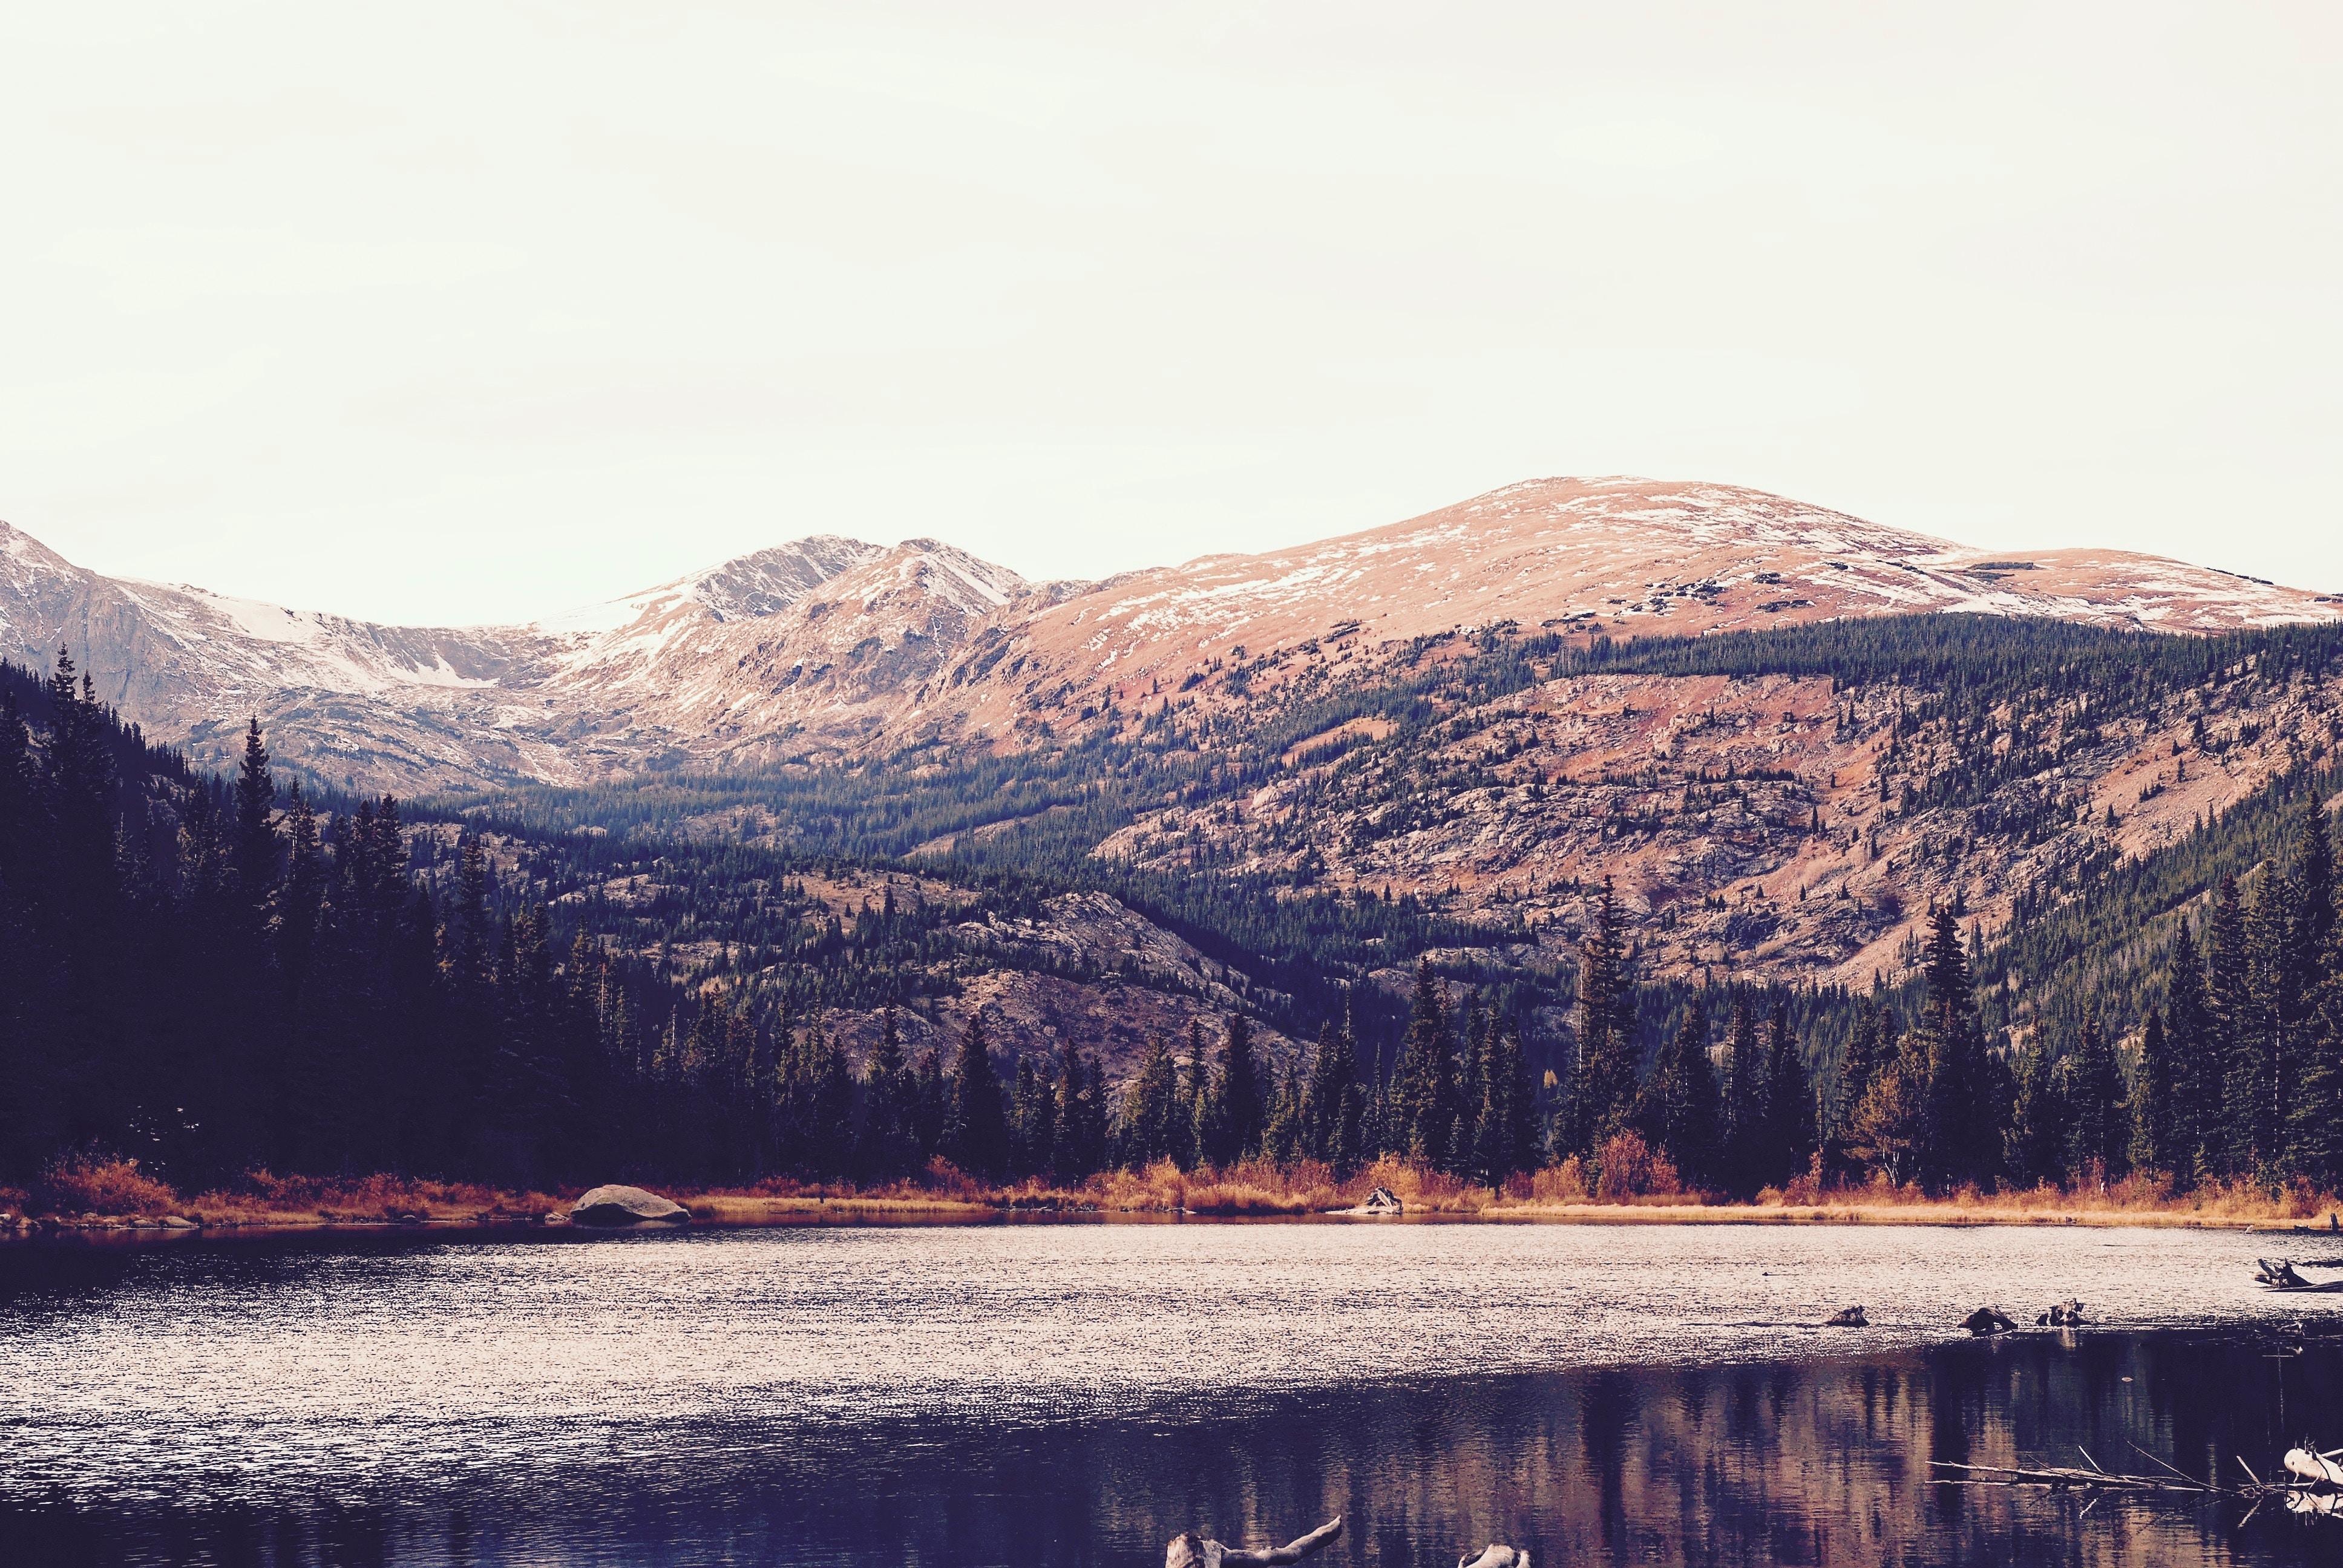 lake along mountain